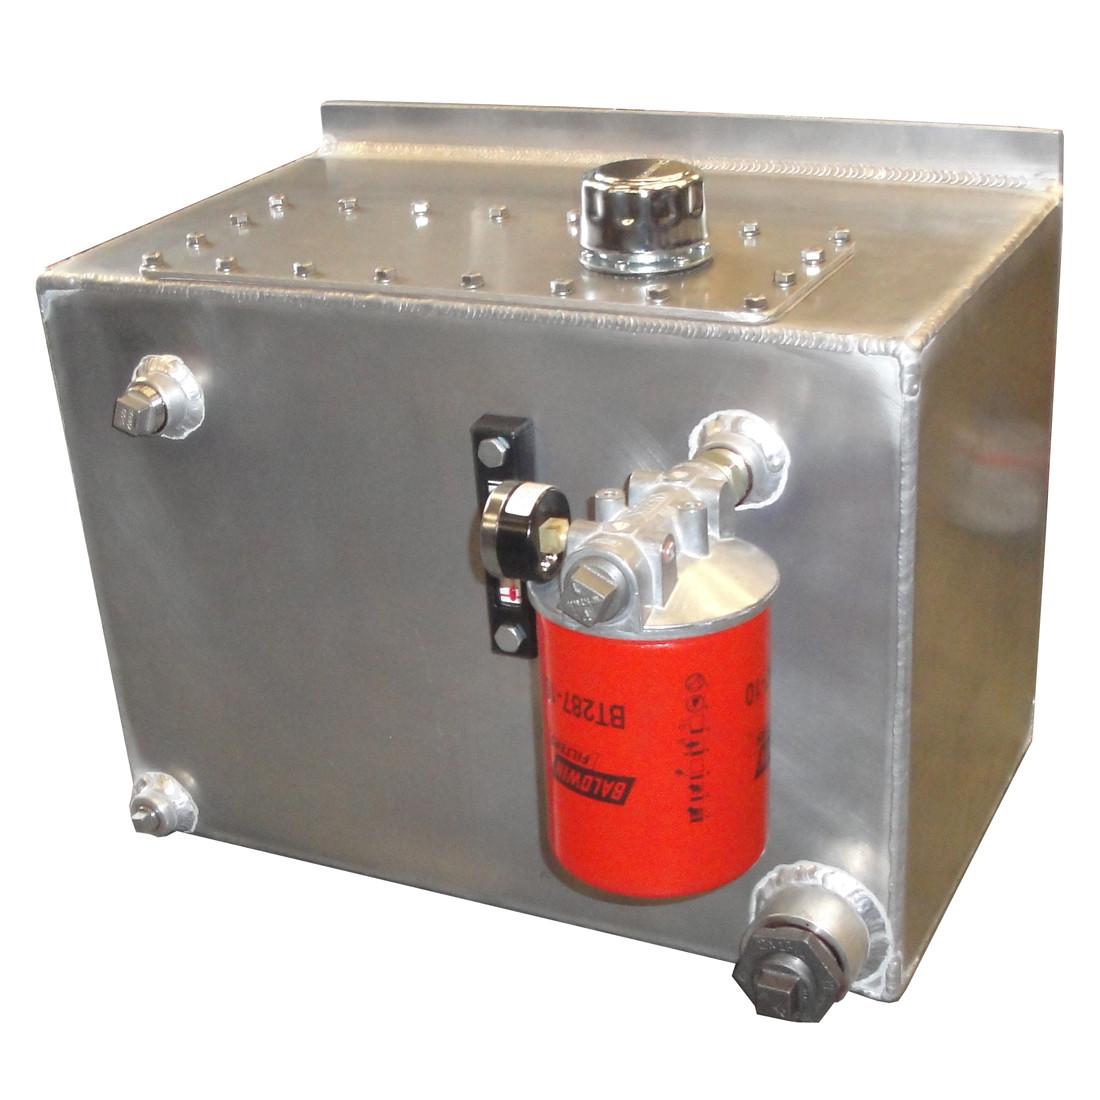 InMac-Kolstrand Aluminum Hydraulic Oil Reservoir-20 Gallon Capacity with  Shut-off Valve, Drain Valve, Oil Level & Temperature Gauge, Return Line